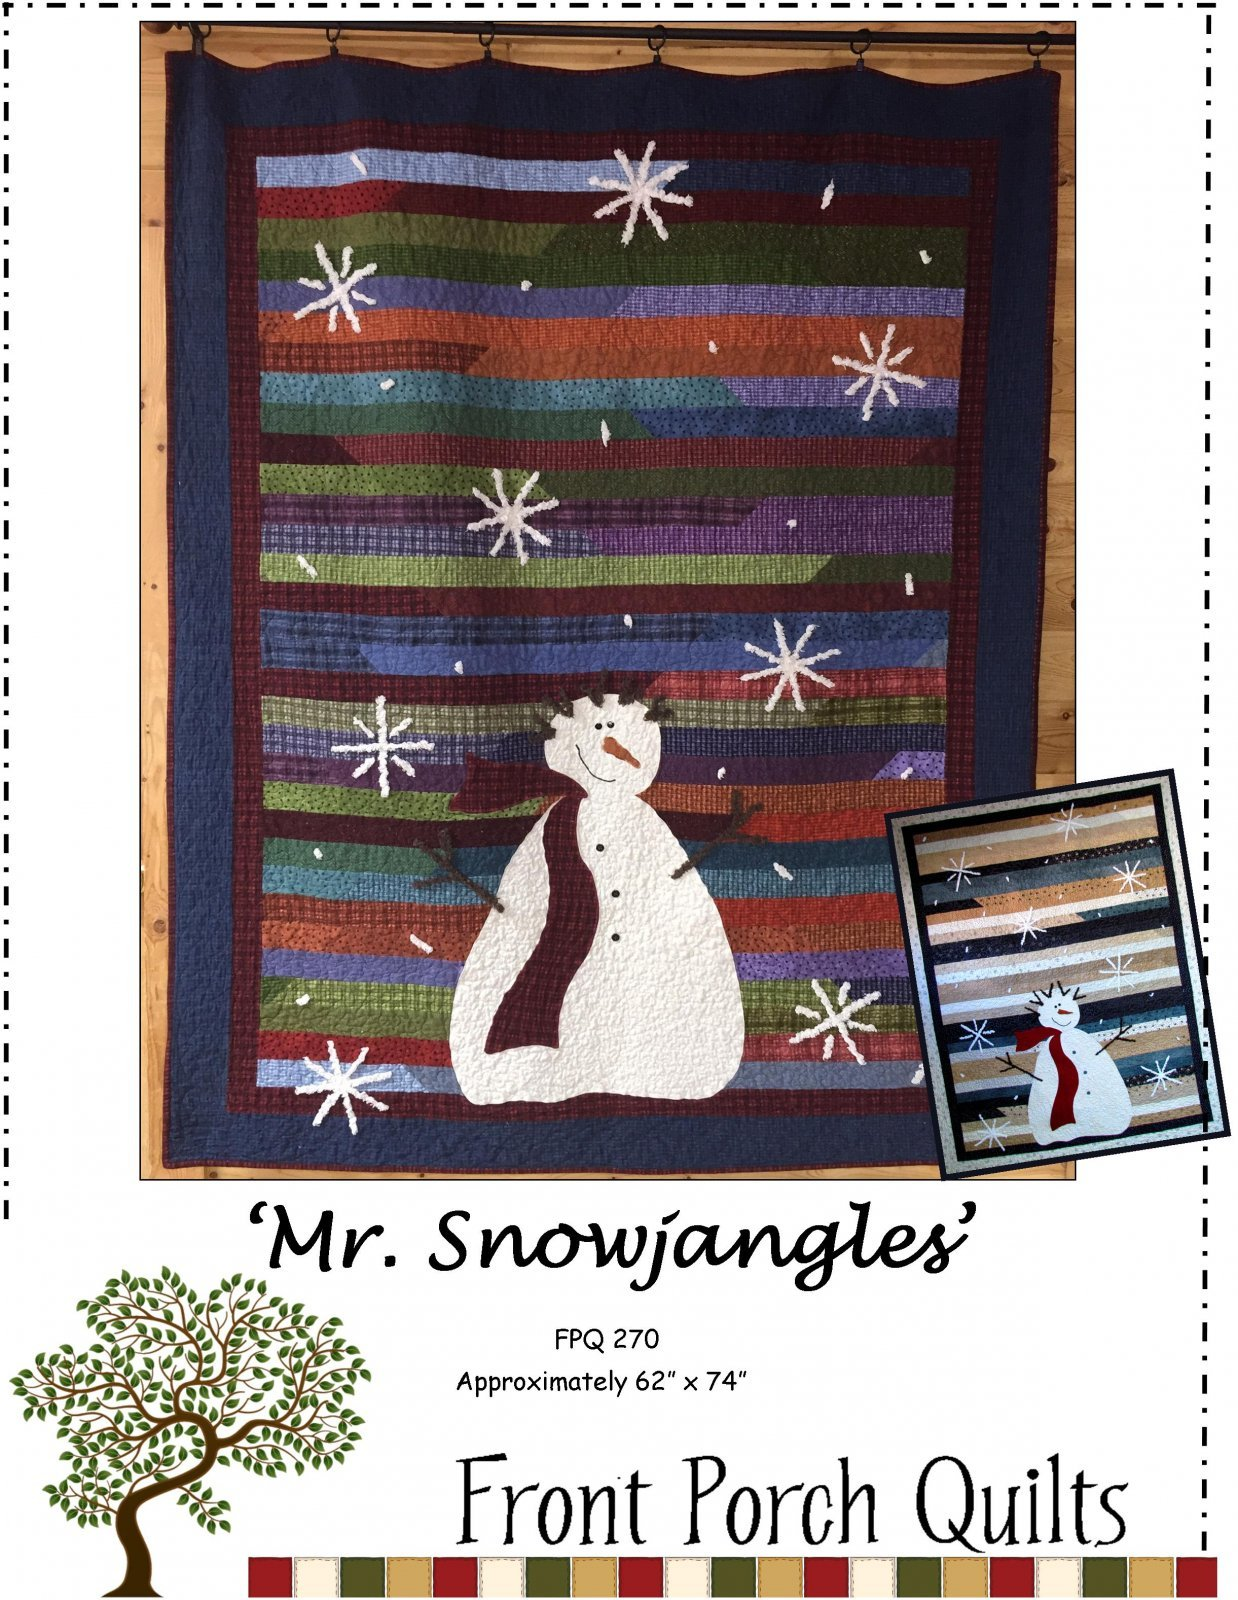 Mr. Snowjangles Pattern